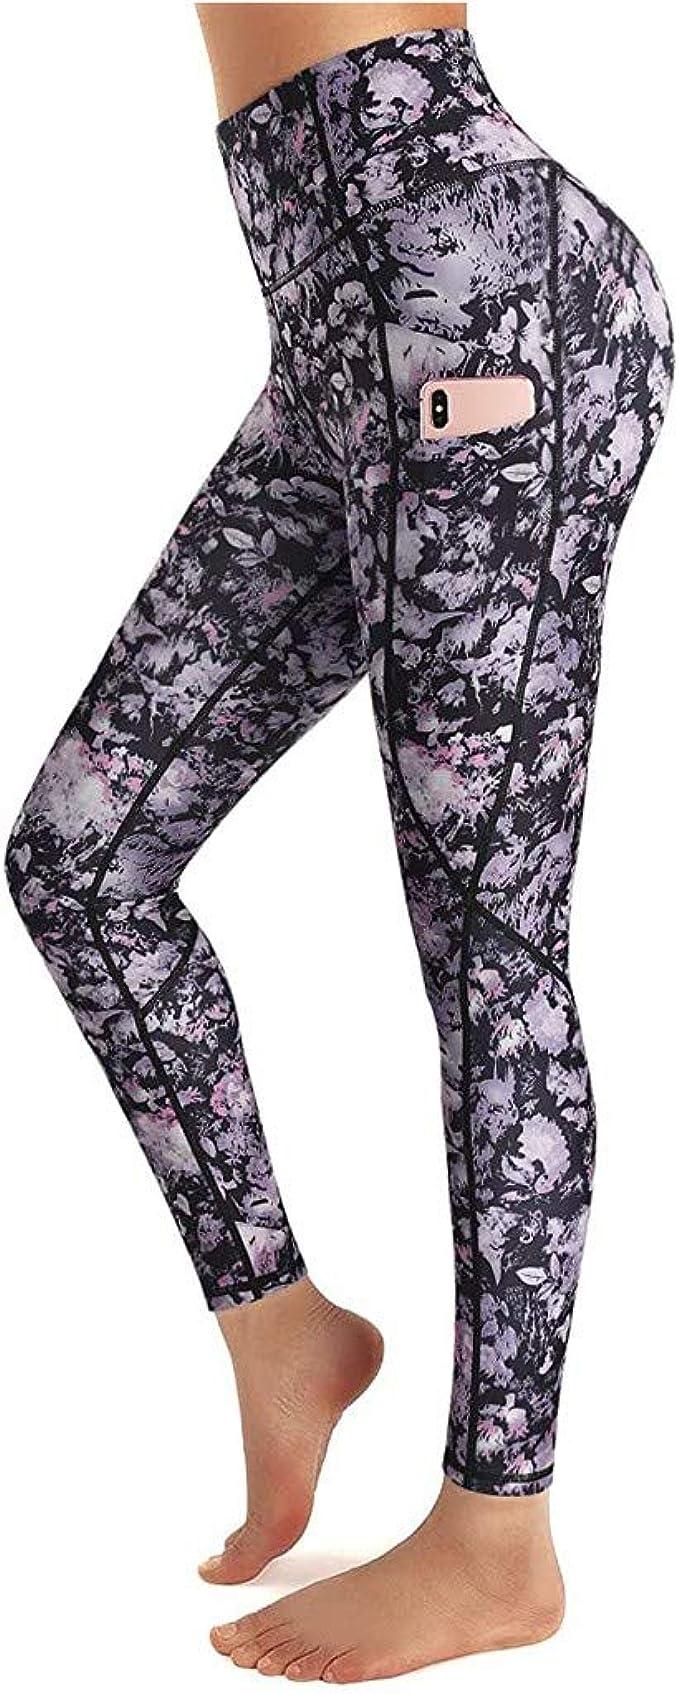 Xinantime Womens Loose Yoga Pants Pockets Leopard Print High Waist Workout Leggings Running Pants